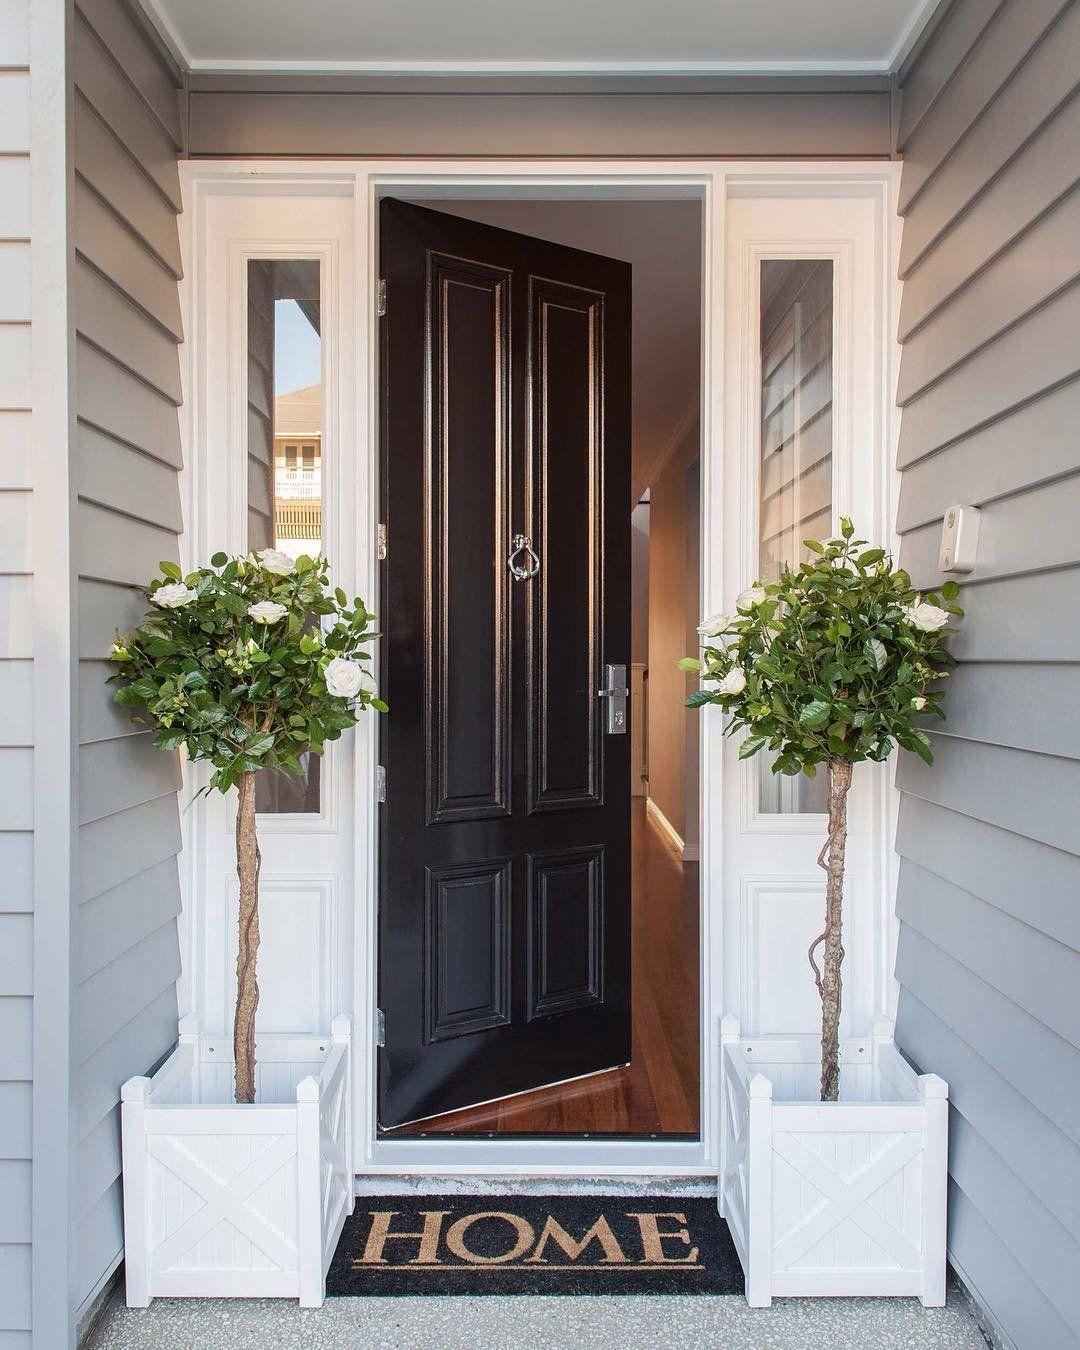 Best Door Designs House Entrance In India Front Flower Decoration